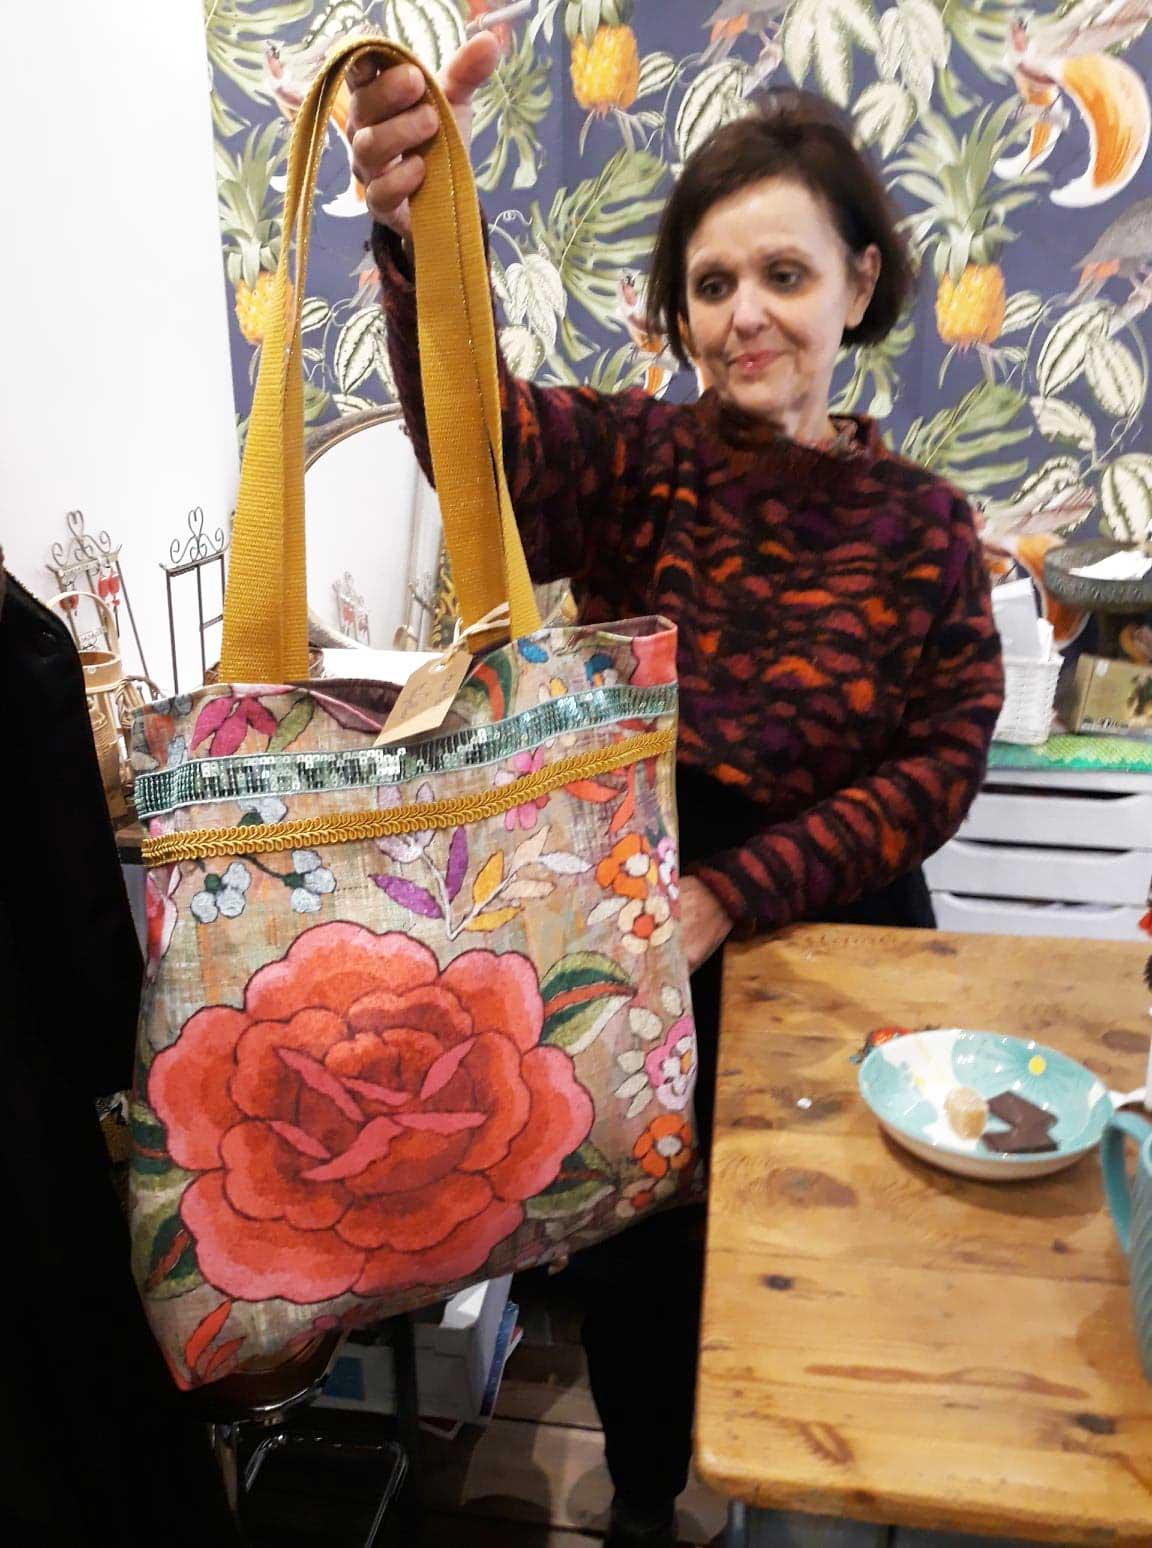 Sylvie-Atelier-des-Merveilles---Jolie-sac---Les-Jolies-Quinquas